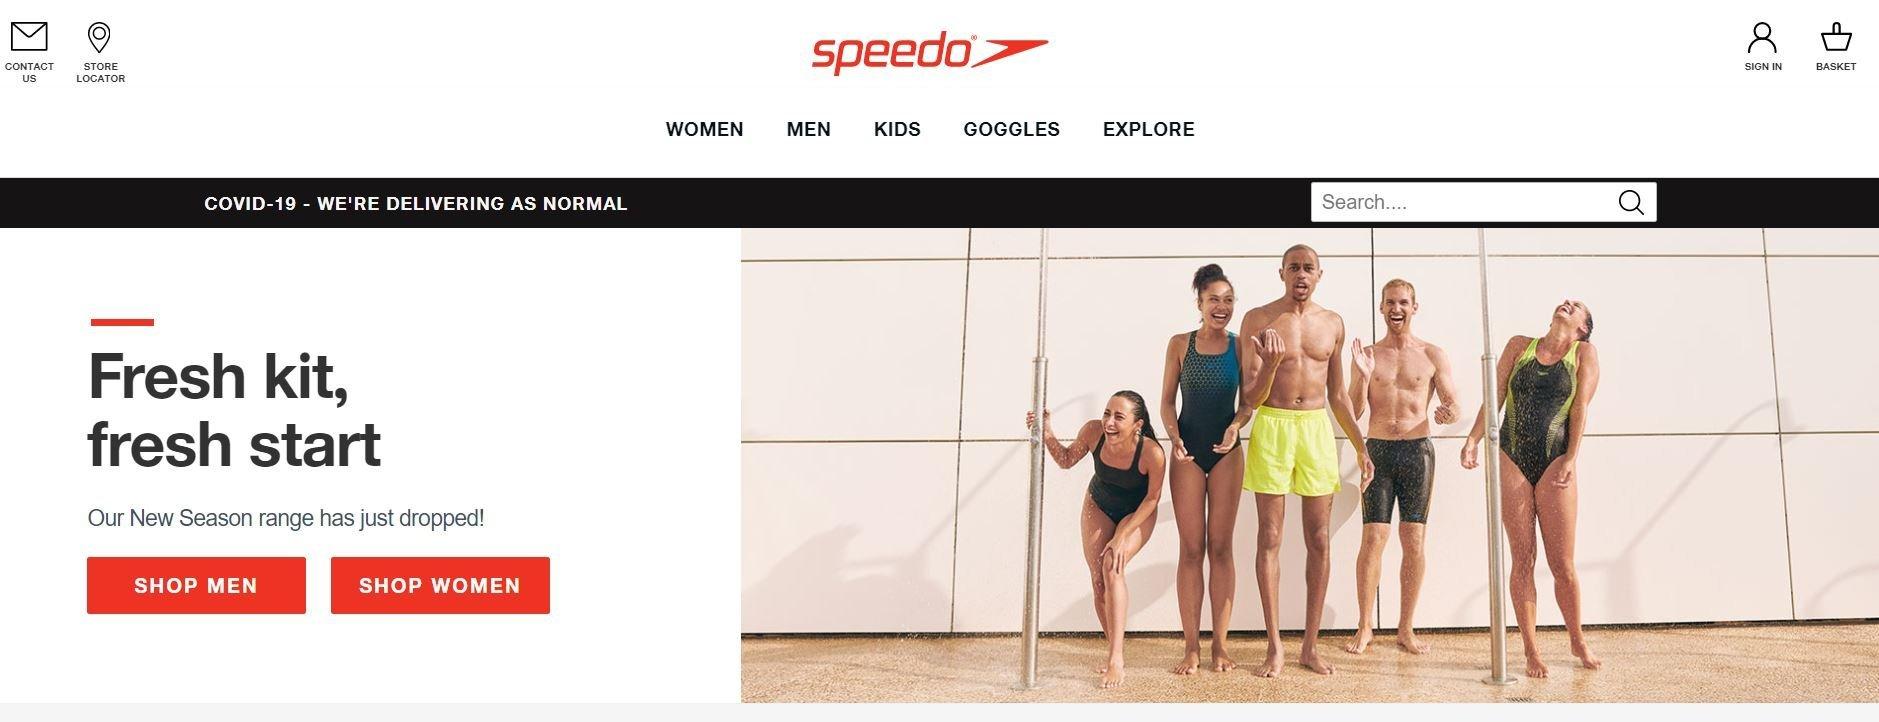 speedo - 2